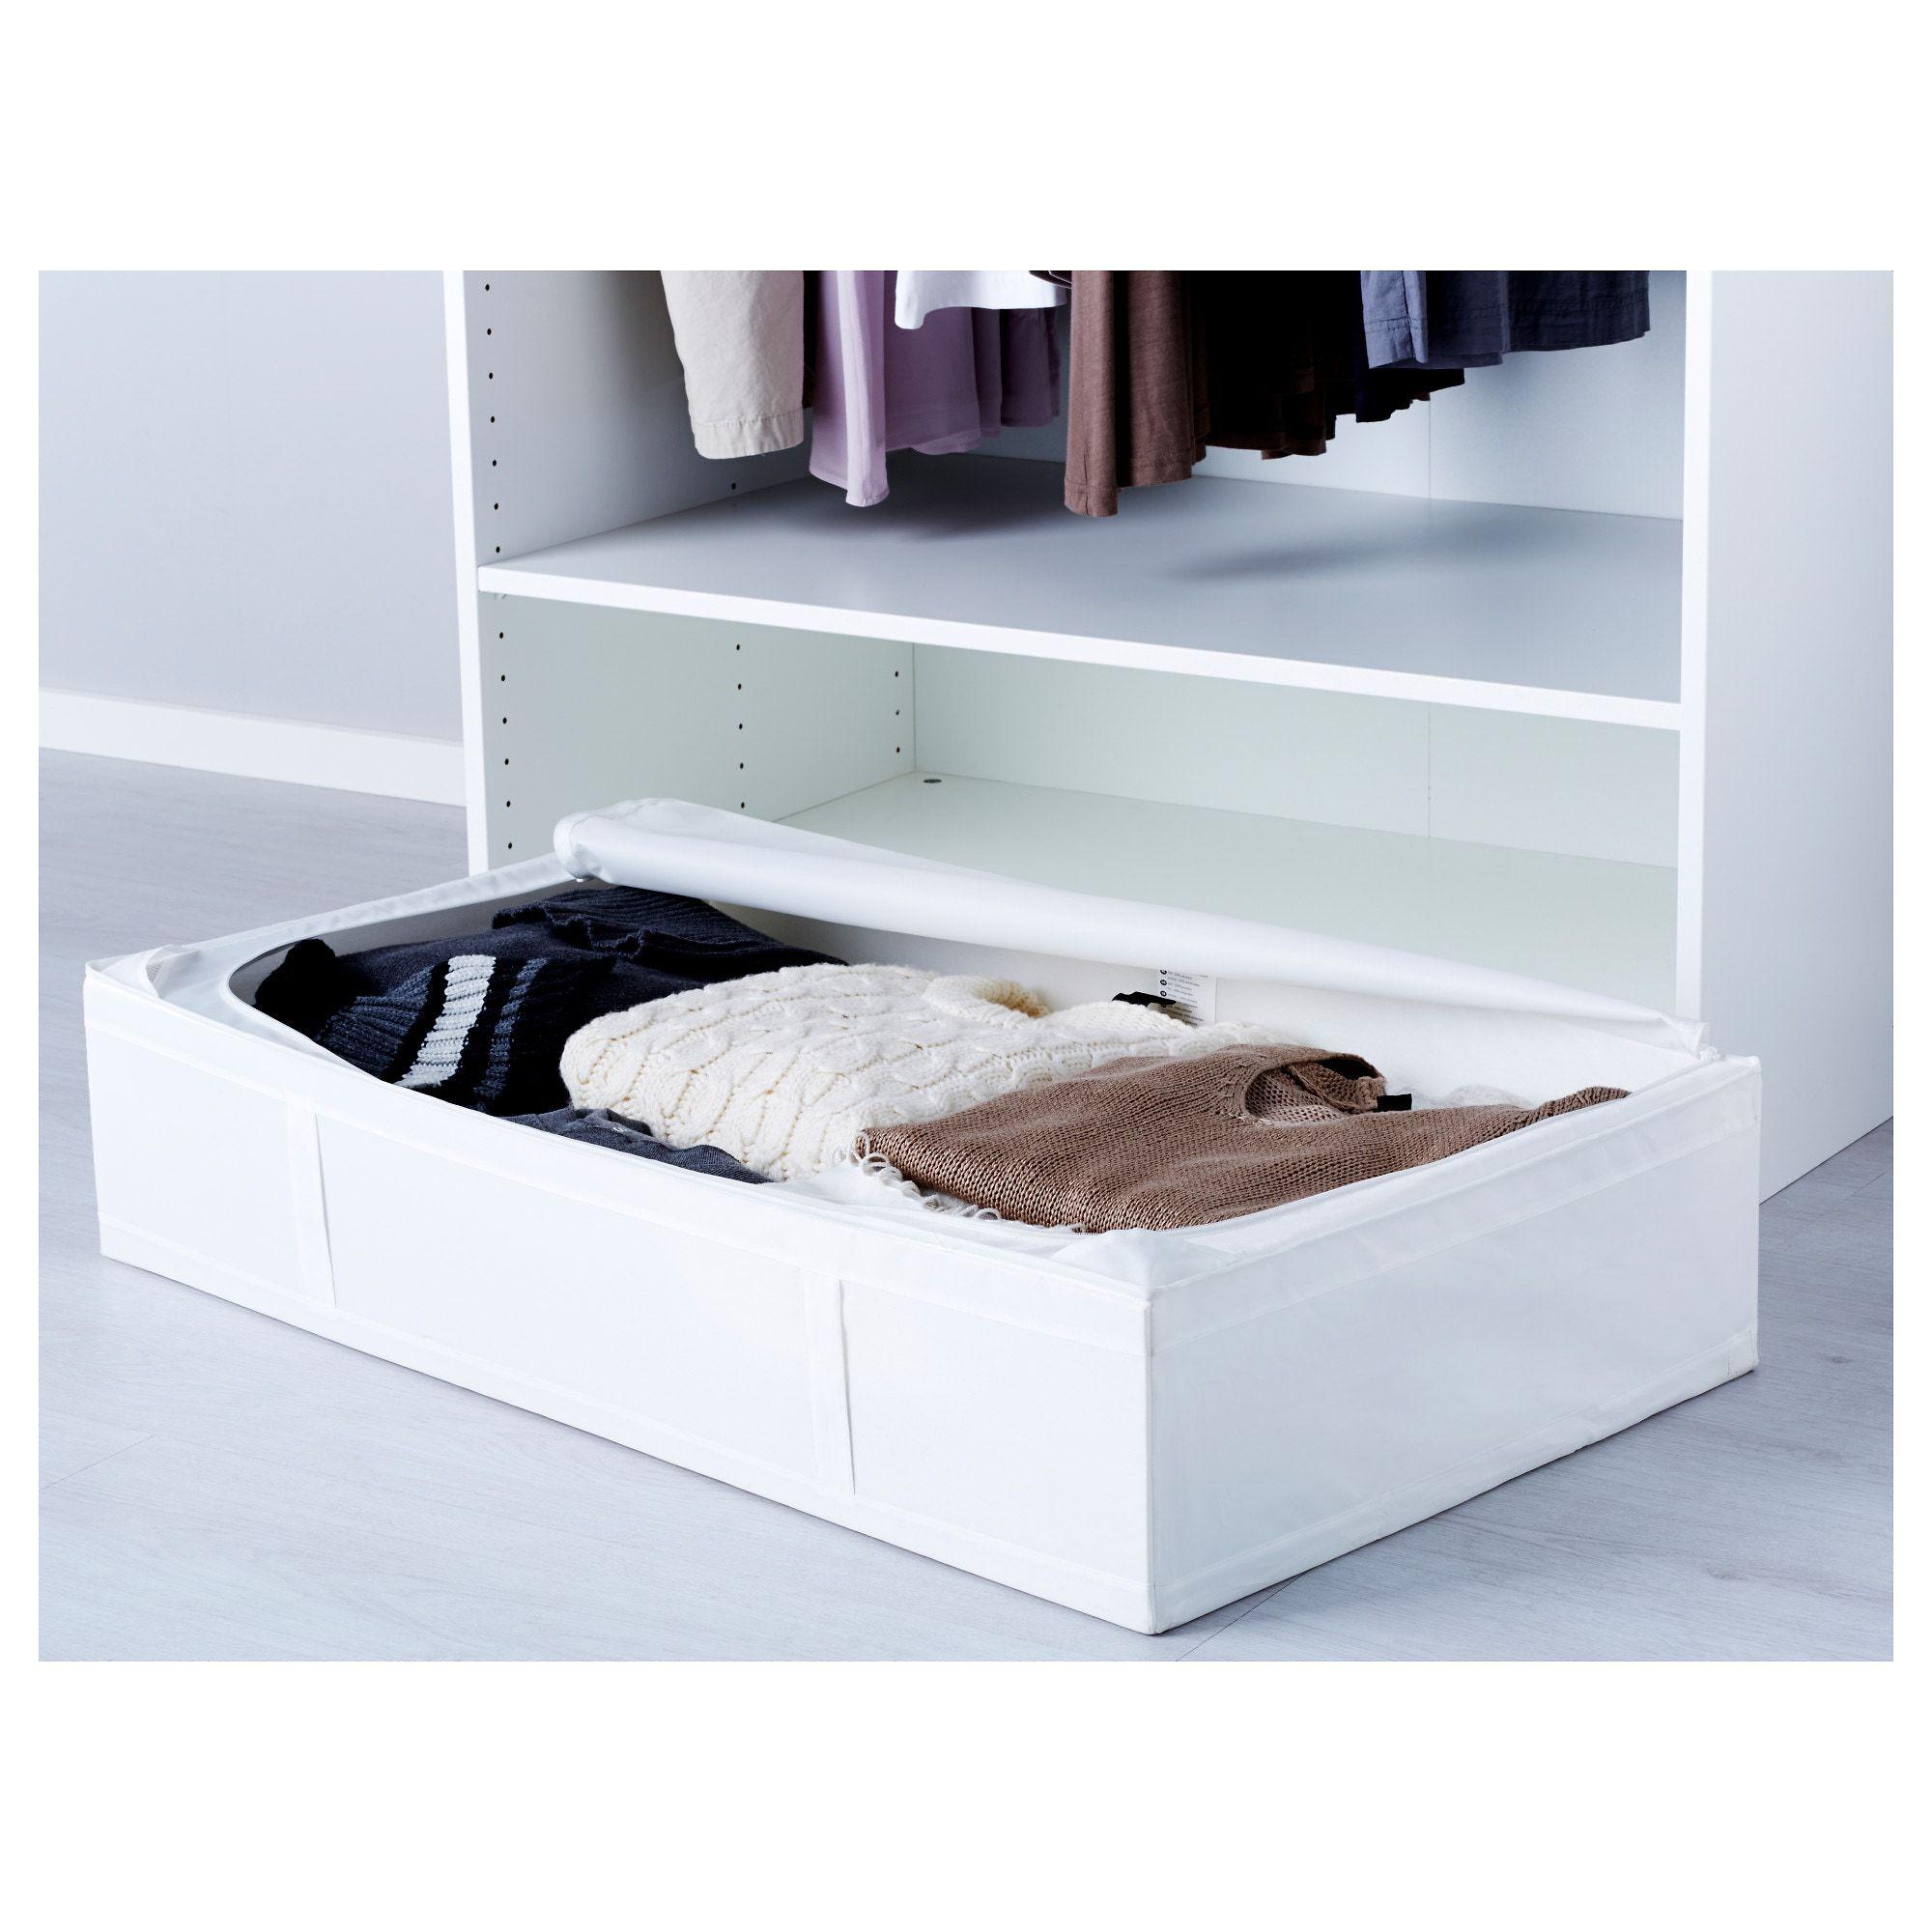 Skubb Sac De Rangement Blanc 93x55x19 Cm Ikea En 2020 Rangement Sac Rangement Ikea